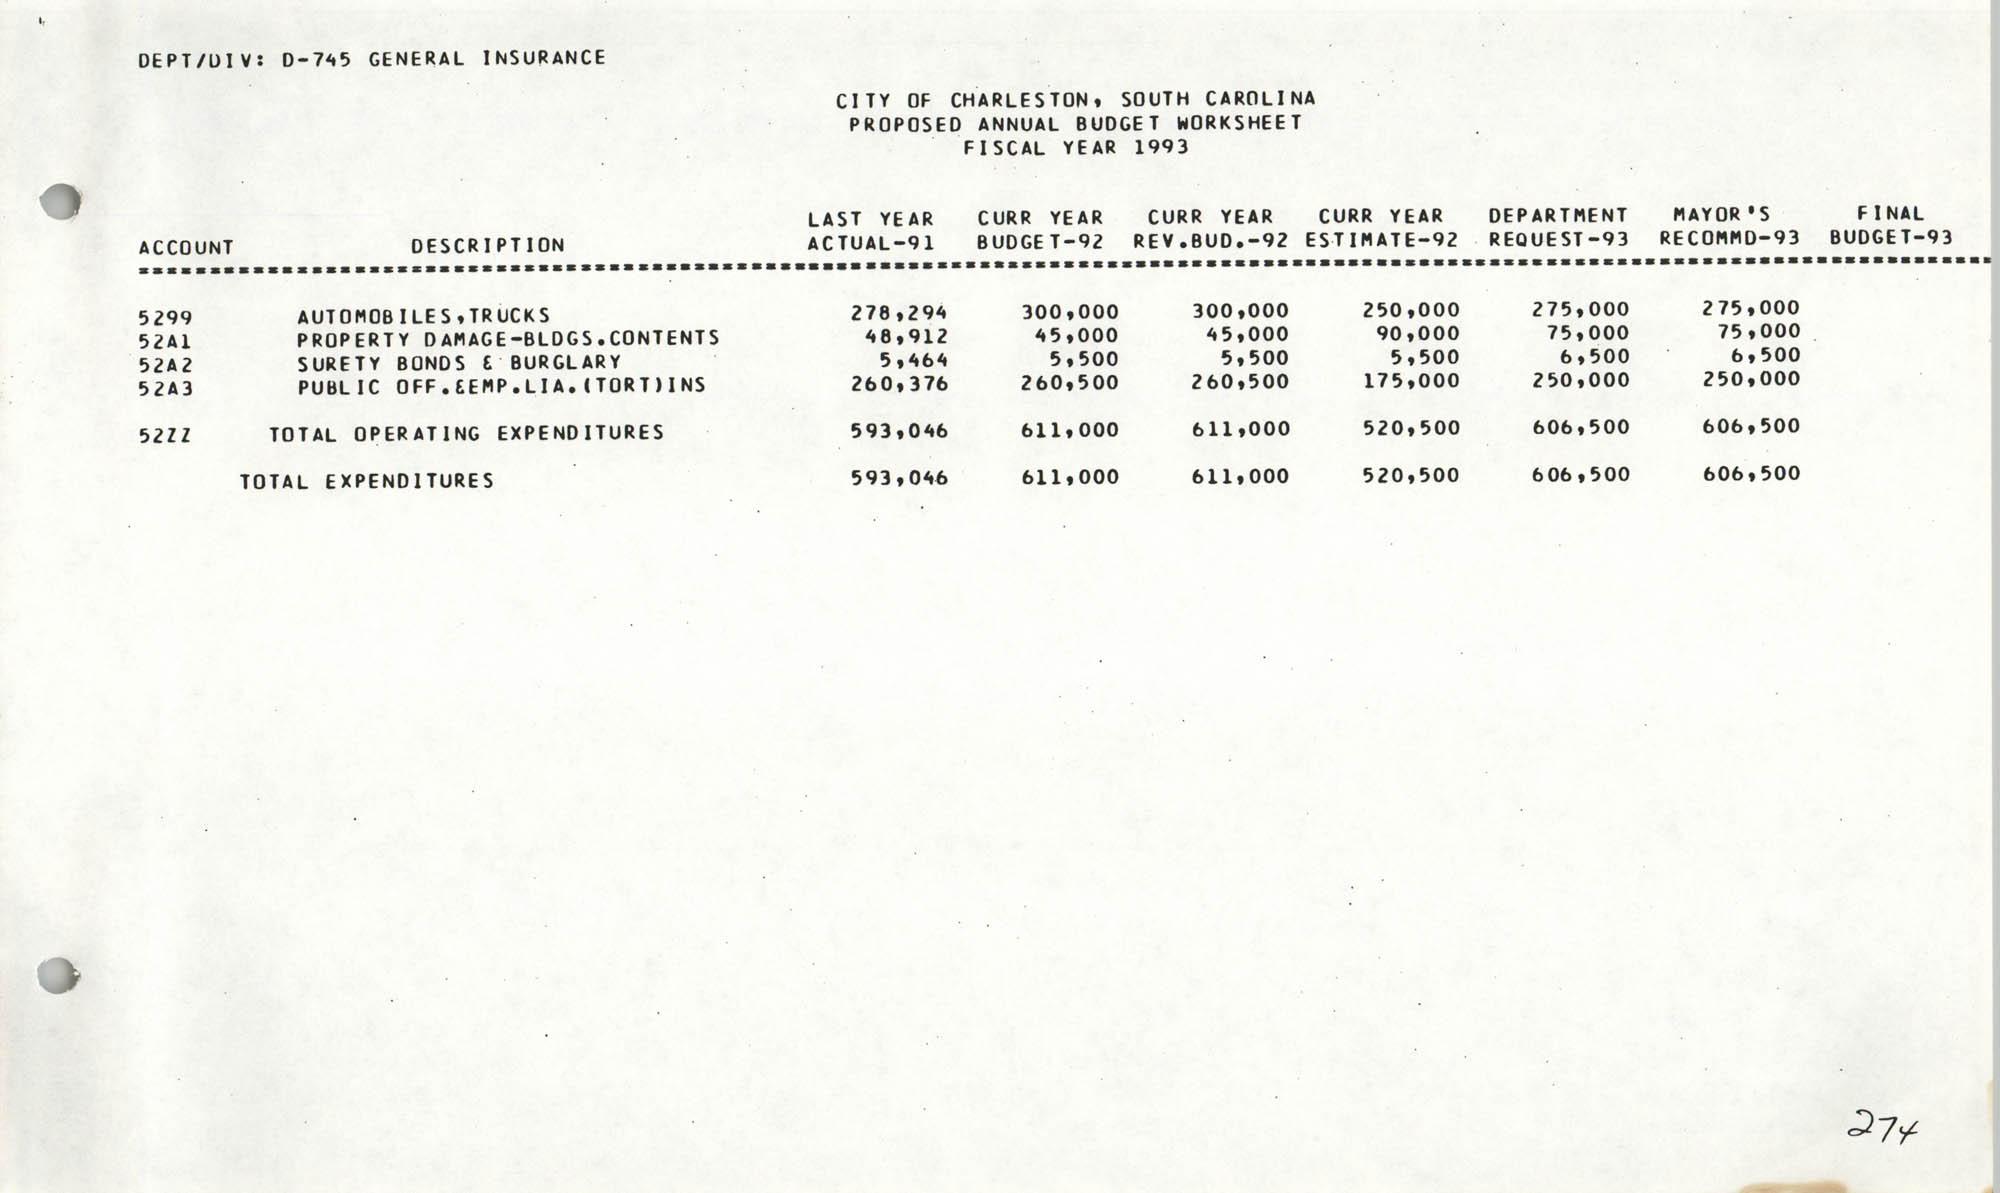 The City Council of Charleston, South Carolina, 1993 Budget, Page 274